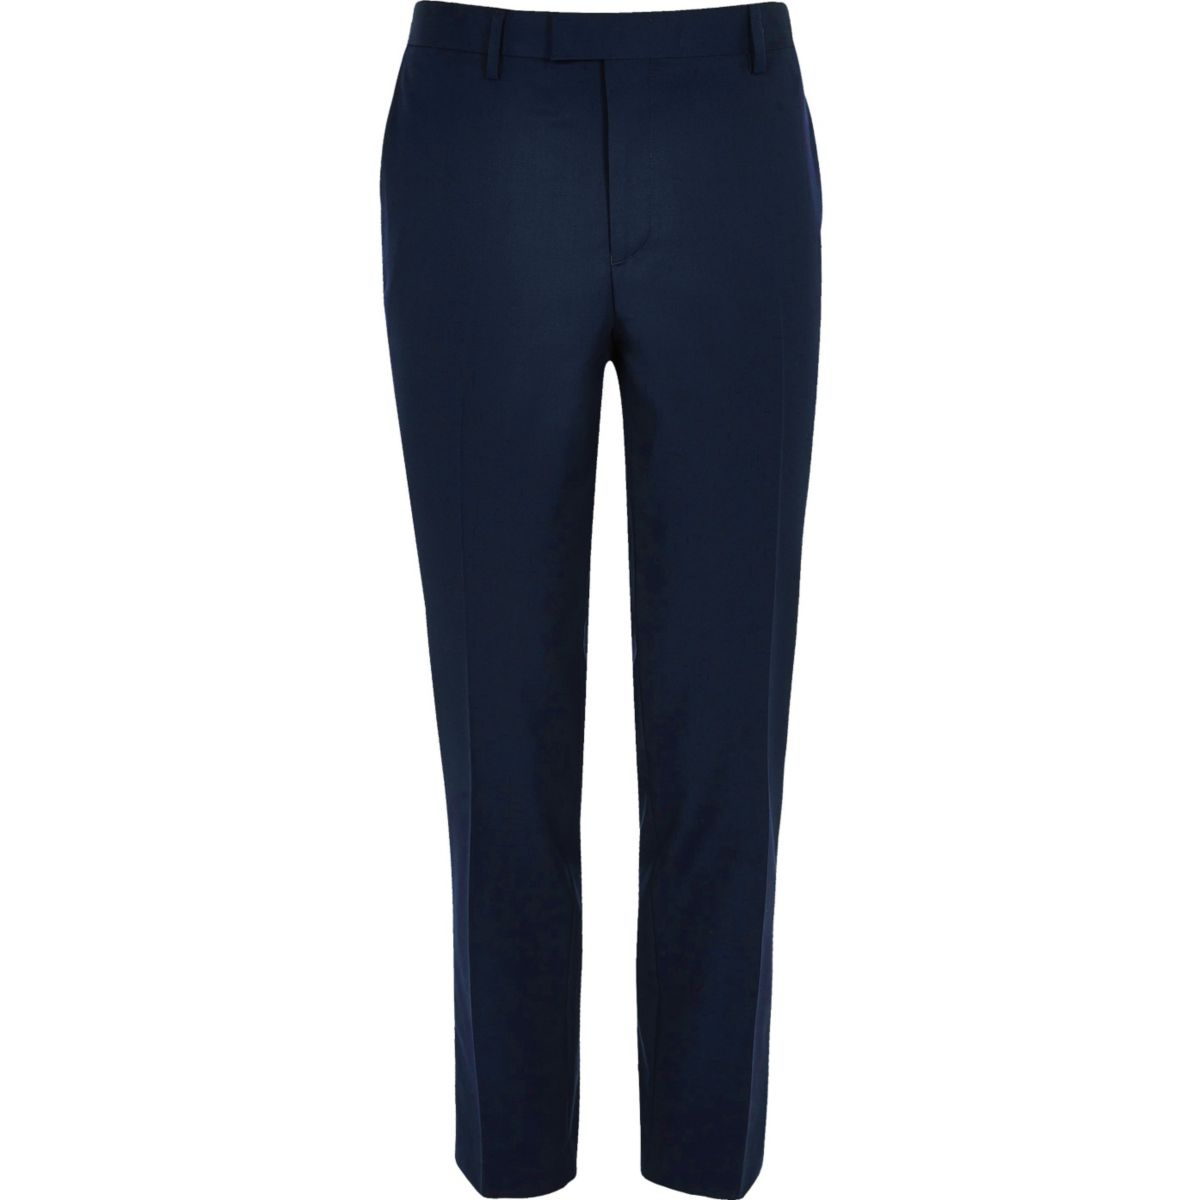 Marineblauwe nette skinny-fit pantalon